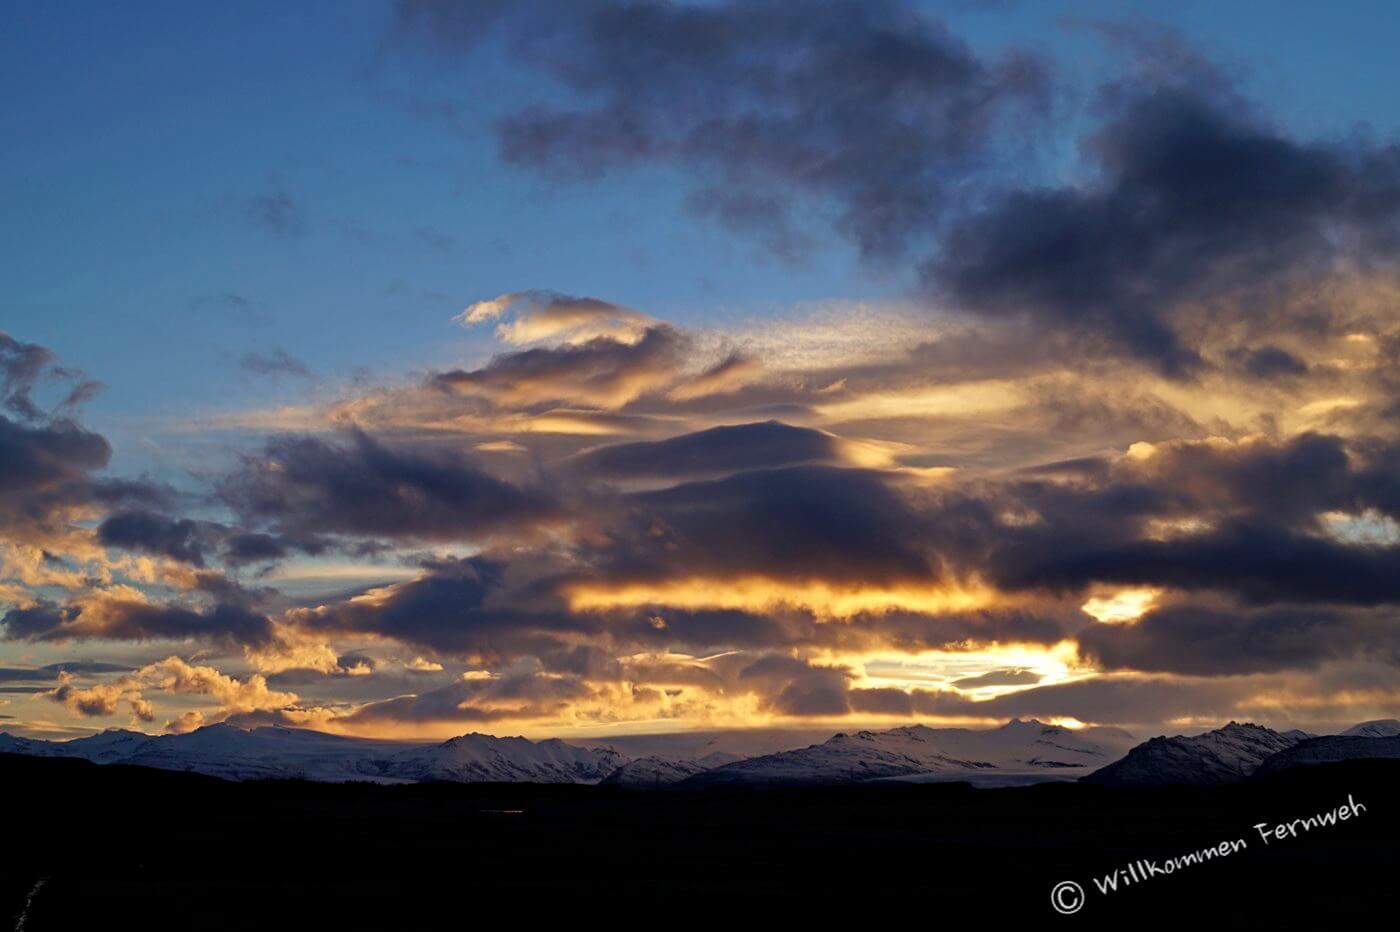 Sonnenuntergang bei Höfn mit Bergen des Vatnajökull-Gletschers